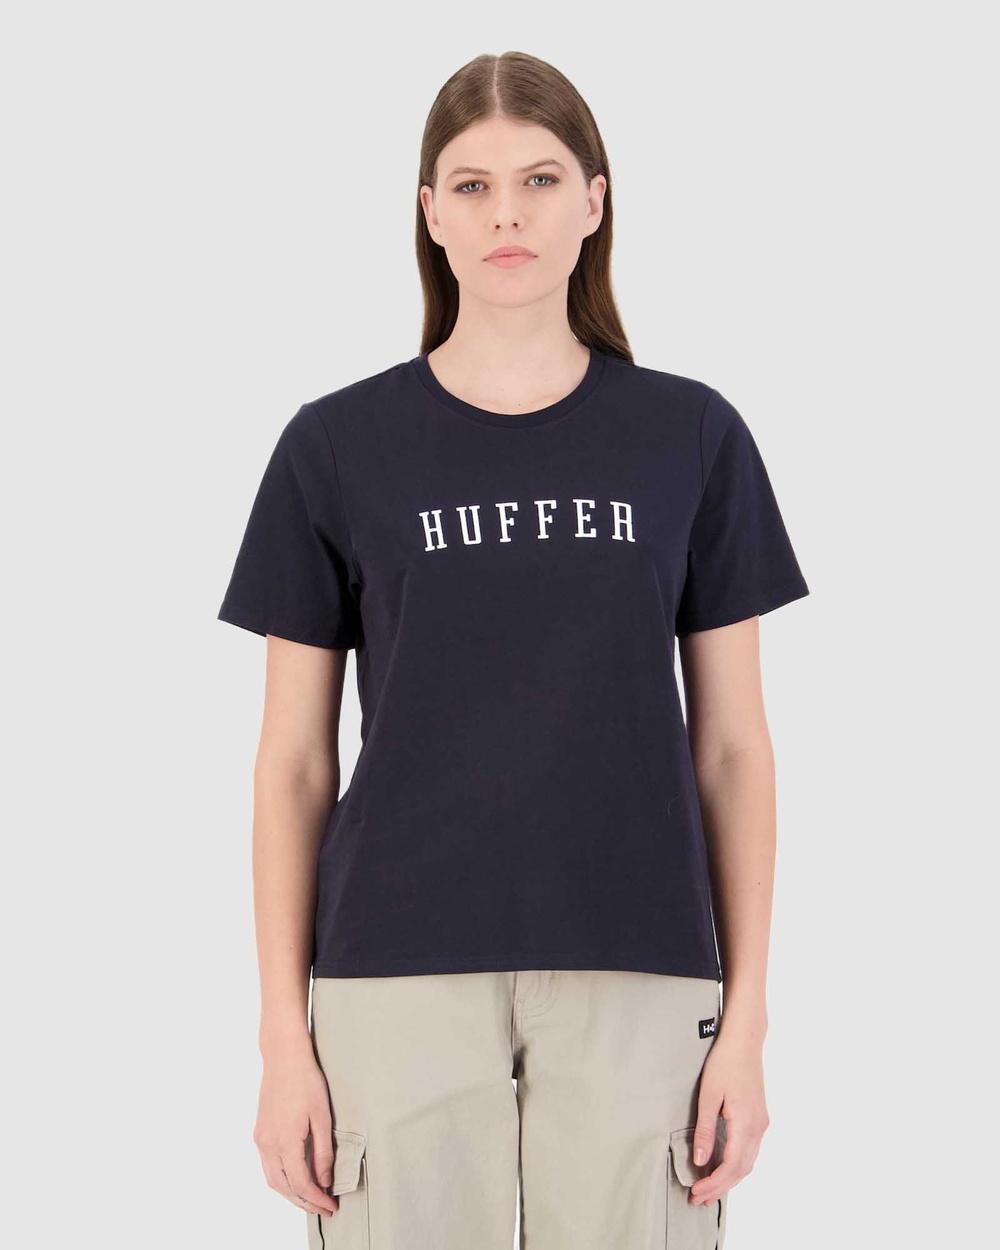 Huffer Women's Stella Tee Stateside T-Shirts & Singlets Blue Tee-Stateside Australia